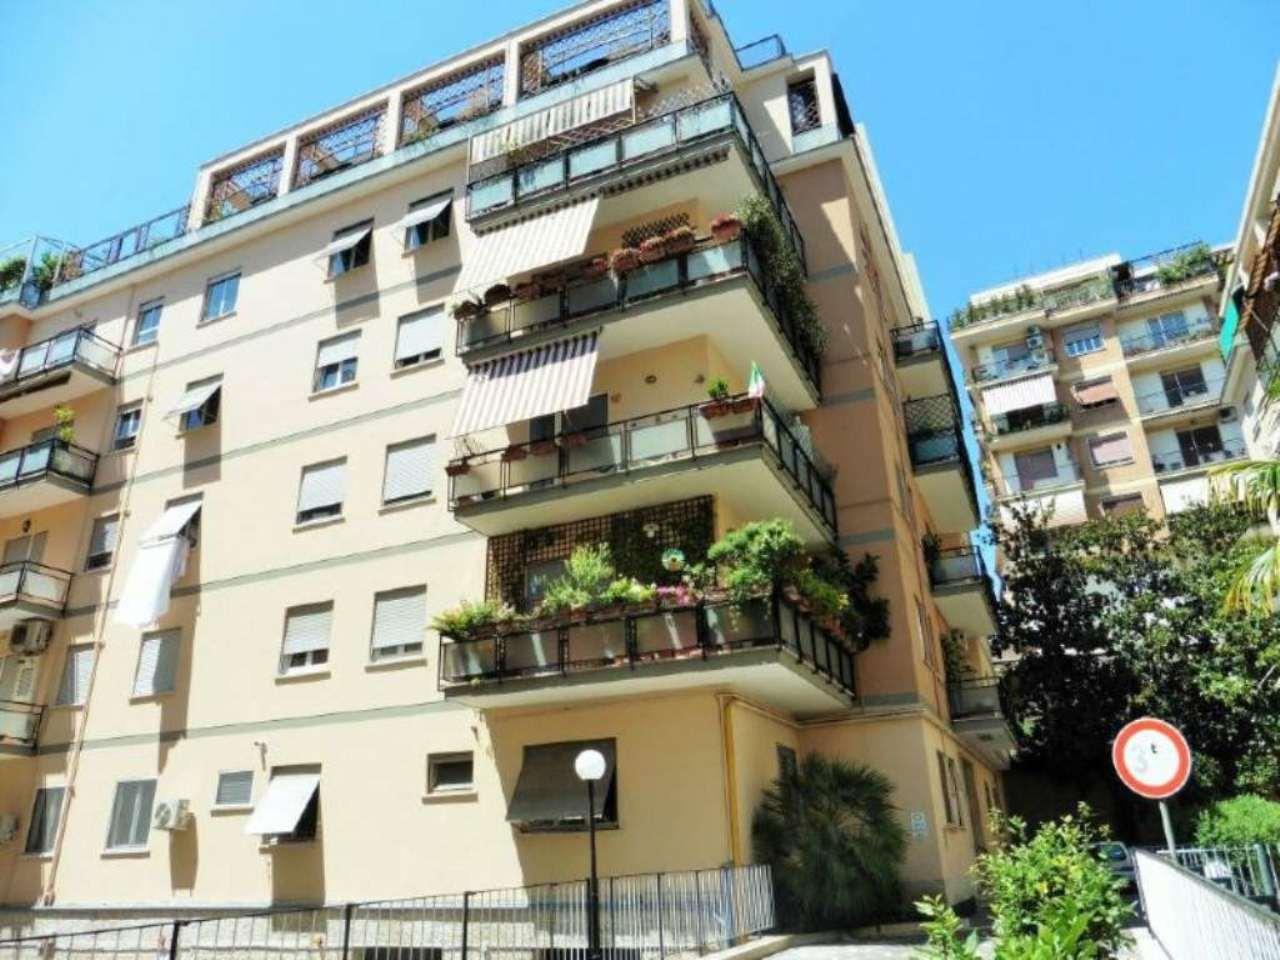 Case e immobili in vendita zona 29 monteverde for Case in vendita roma